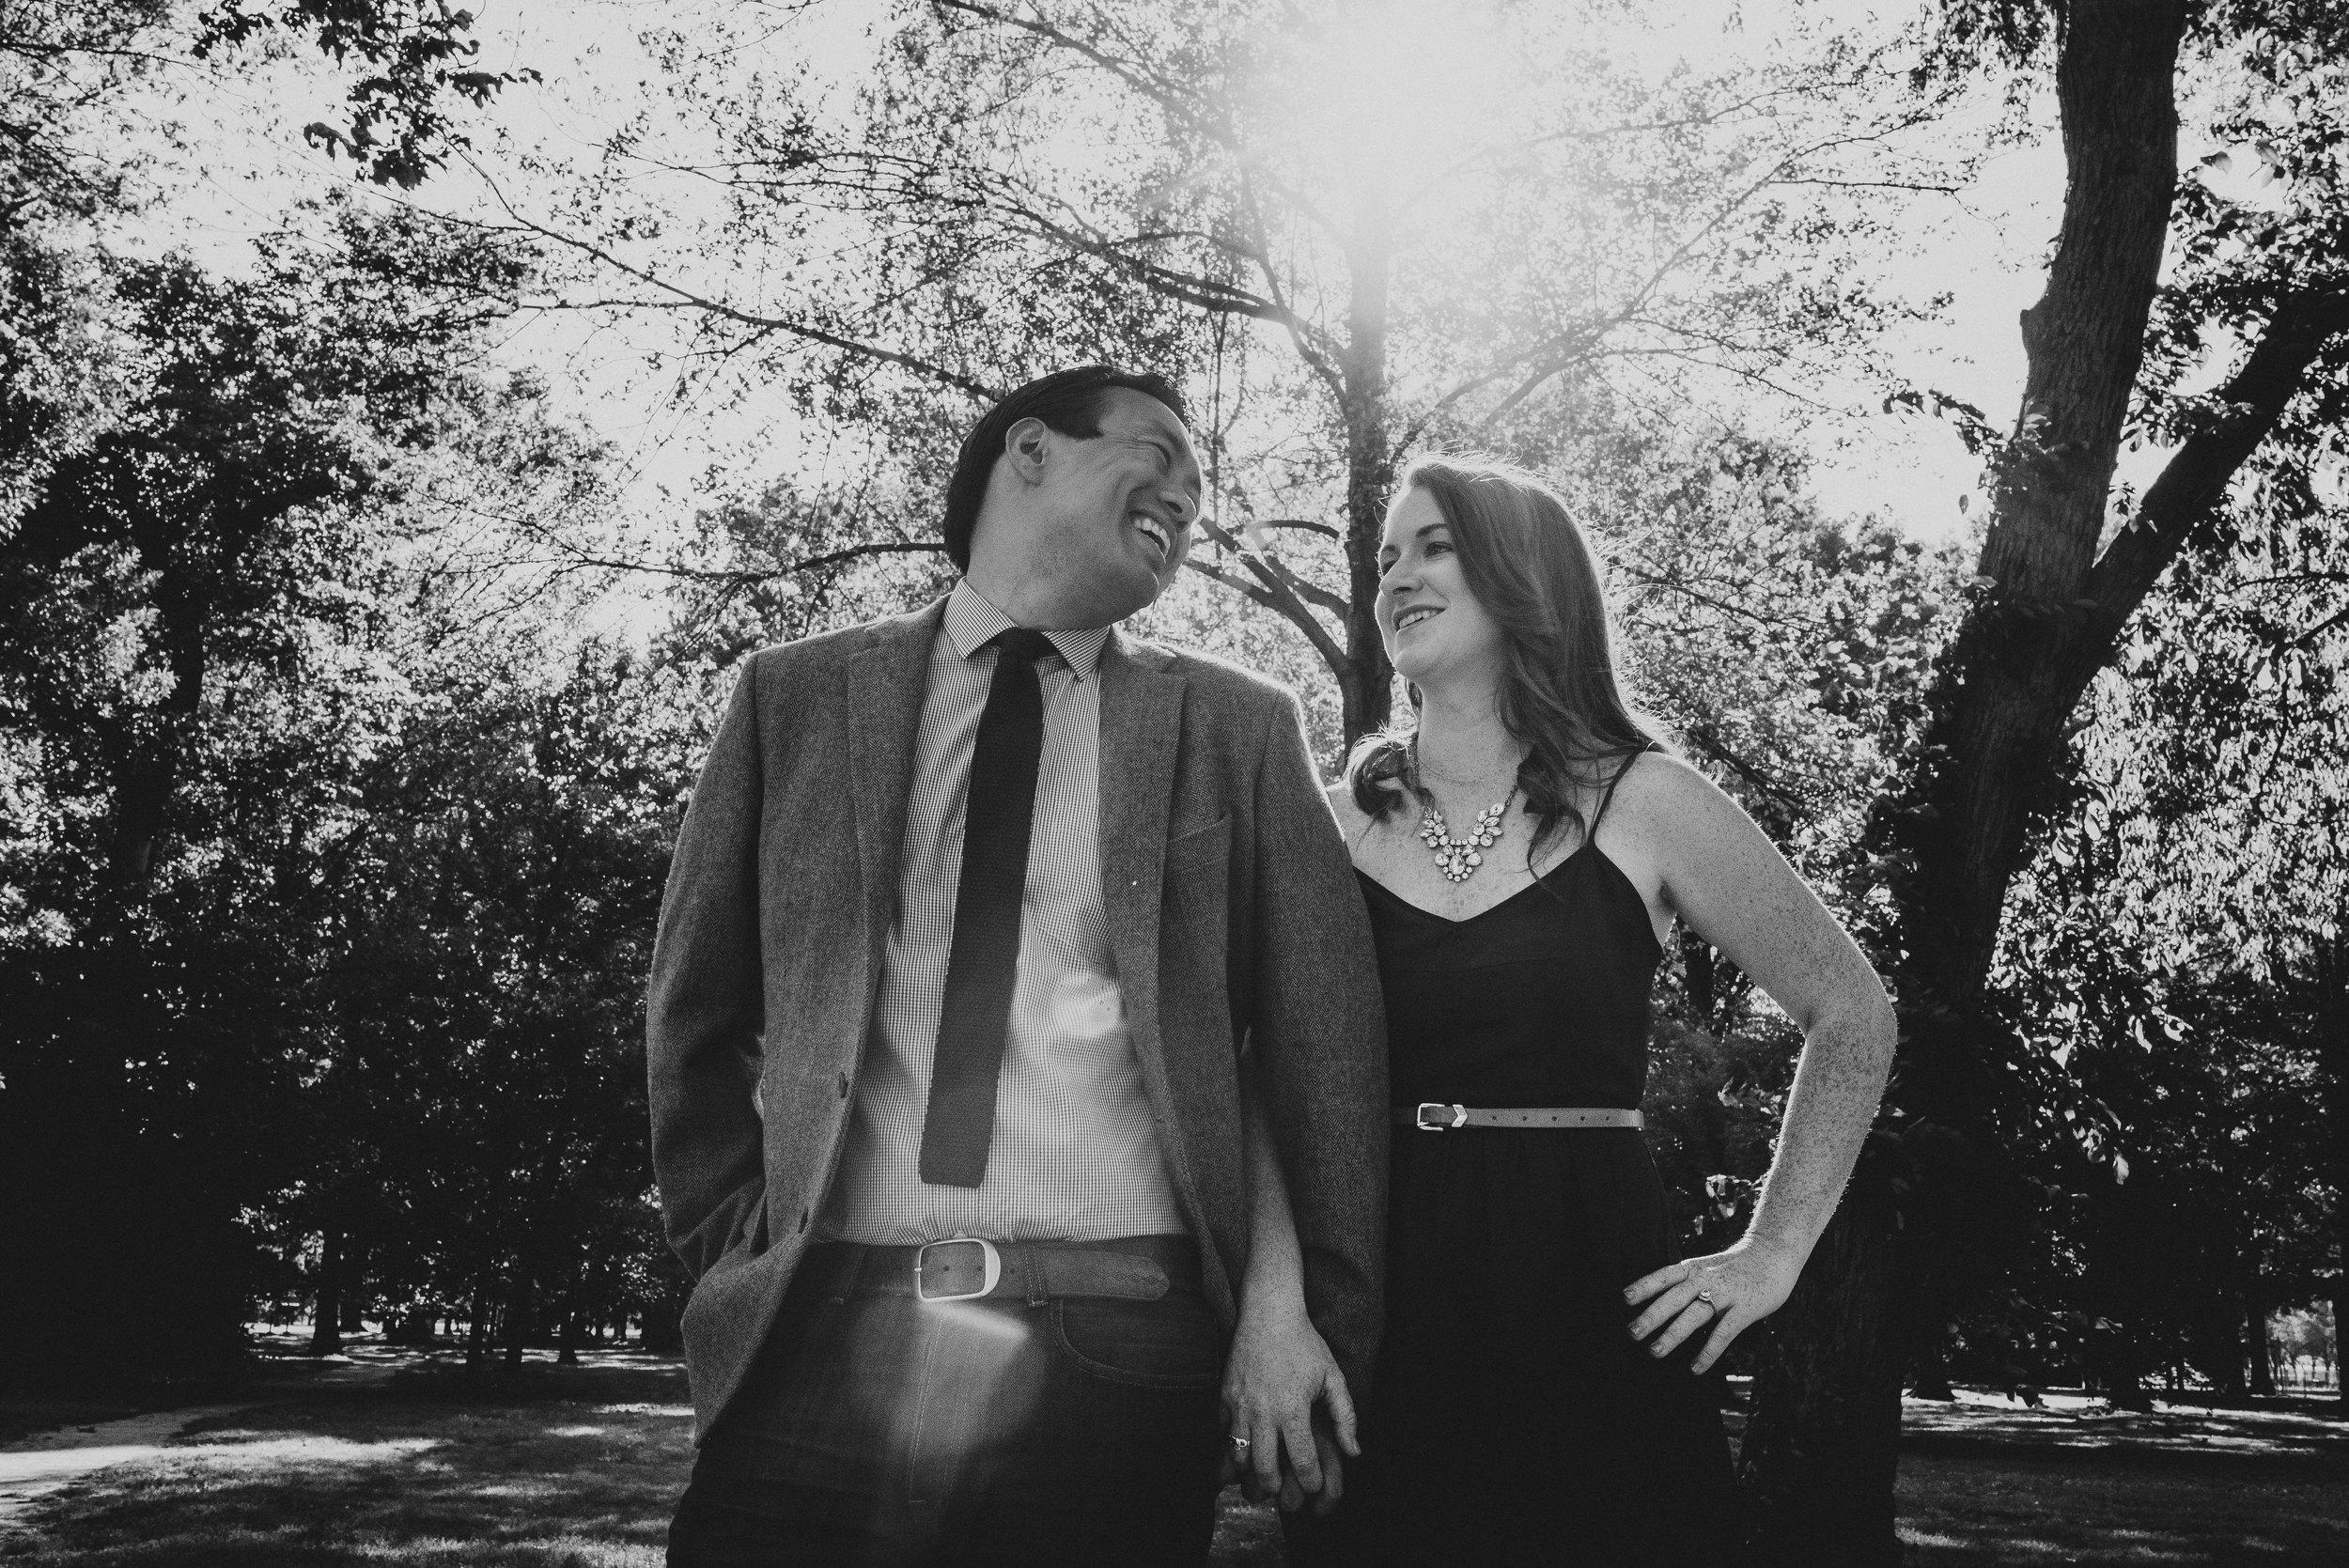 Best Engagement Photographer Washington DC Mantas Kubilinskas-3.jpg